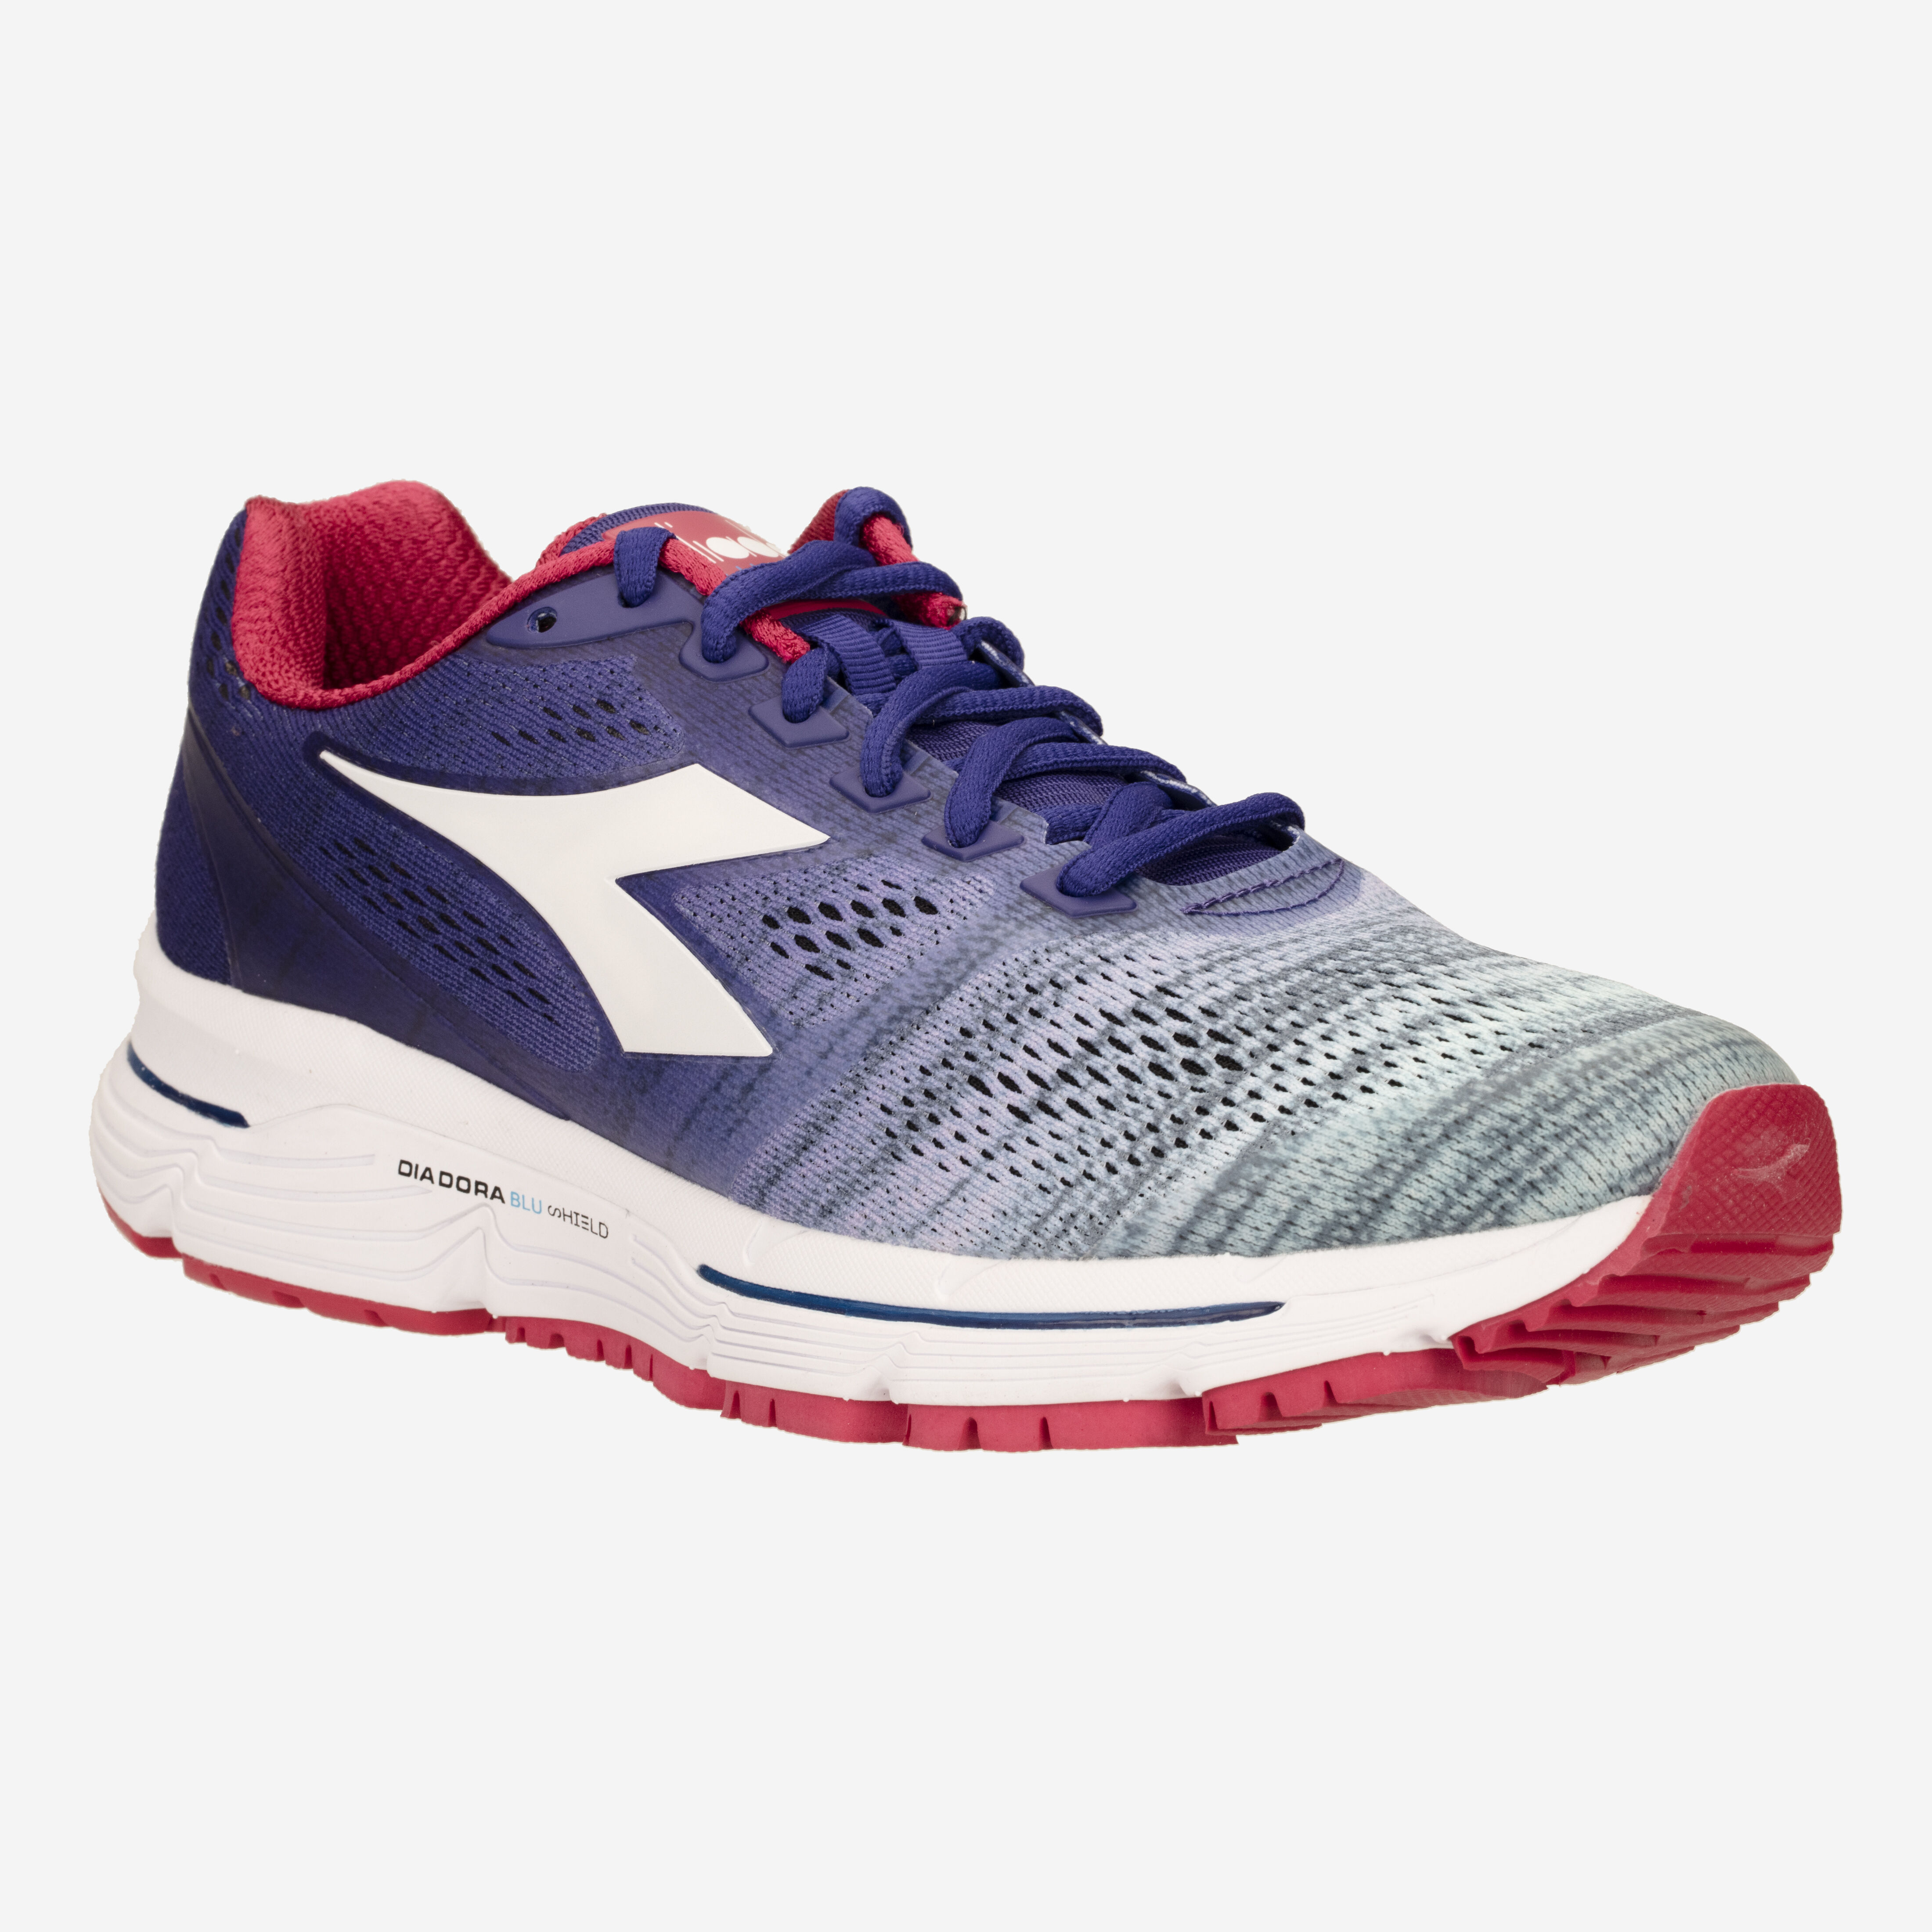 Diadora Womens Athletic Shoes